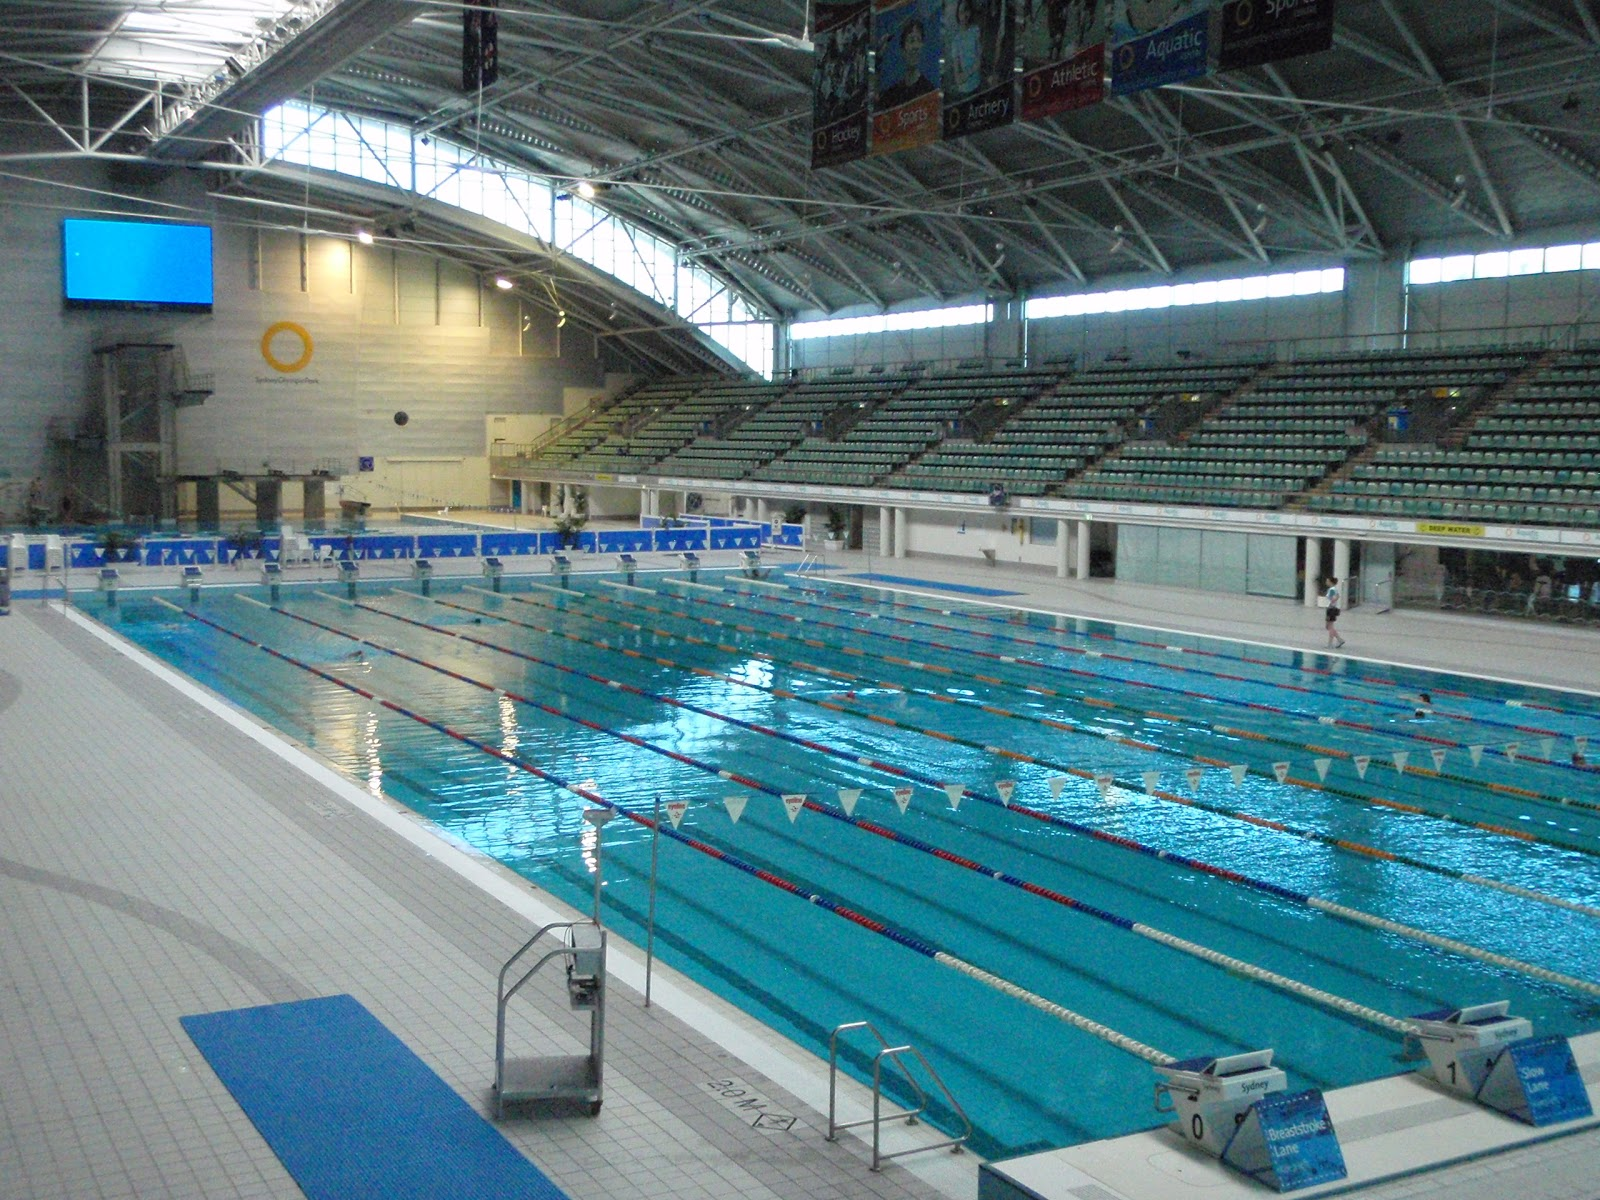 Olympic Swimming Pool 2012: Australia Adventure